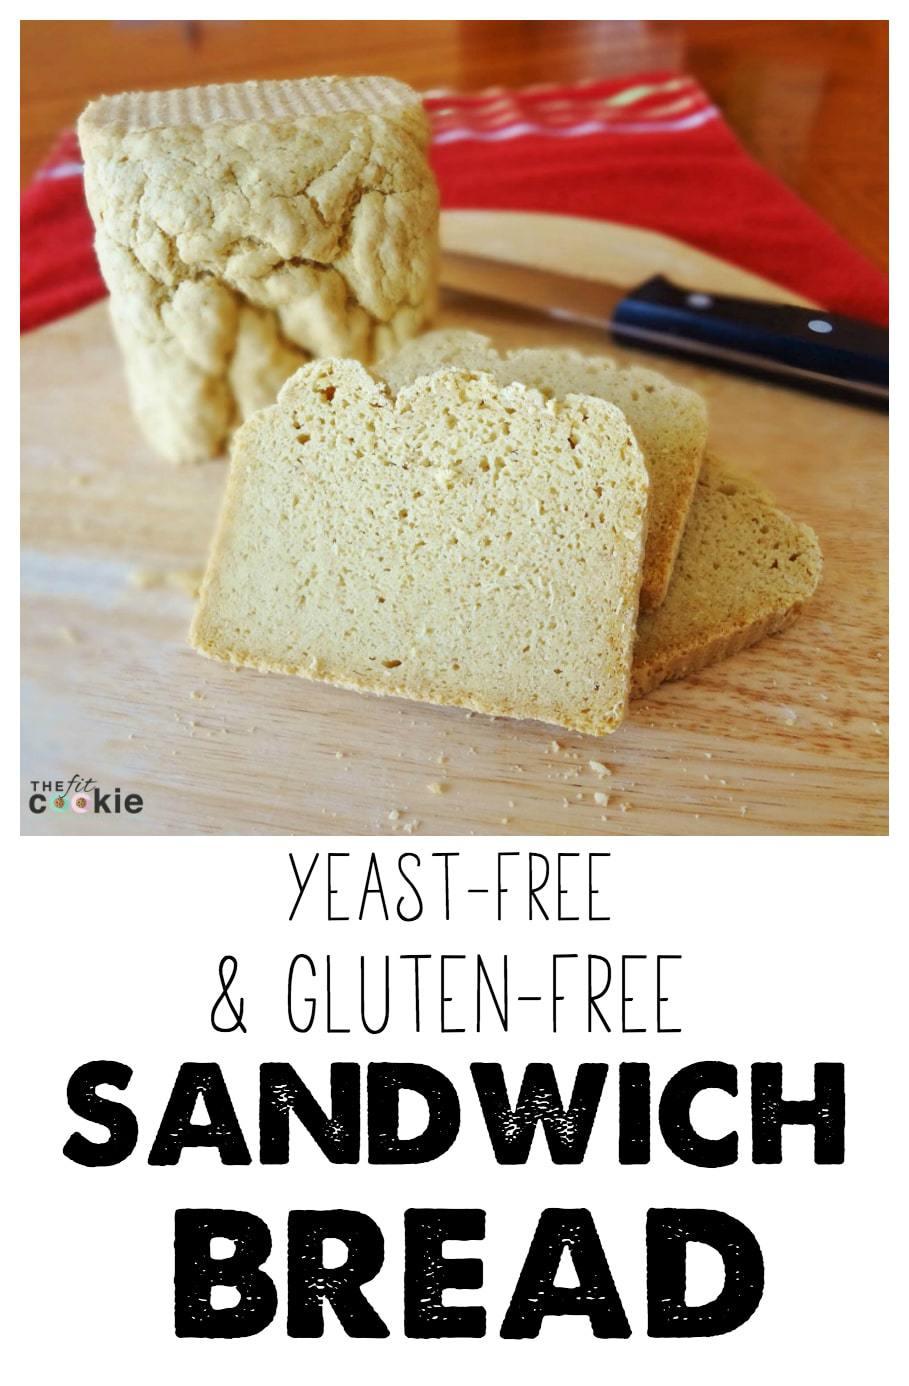 Gluten-free and Yeast-Free Sandwich Bread - @TheFitCookie #recipe #glutenfree #bread #yeastfree